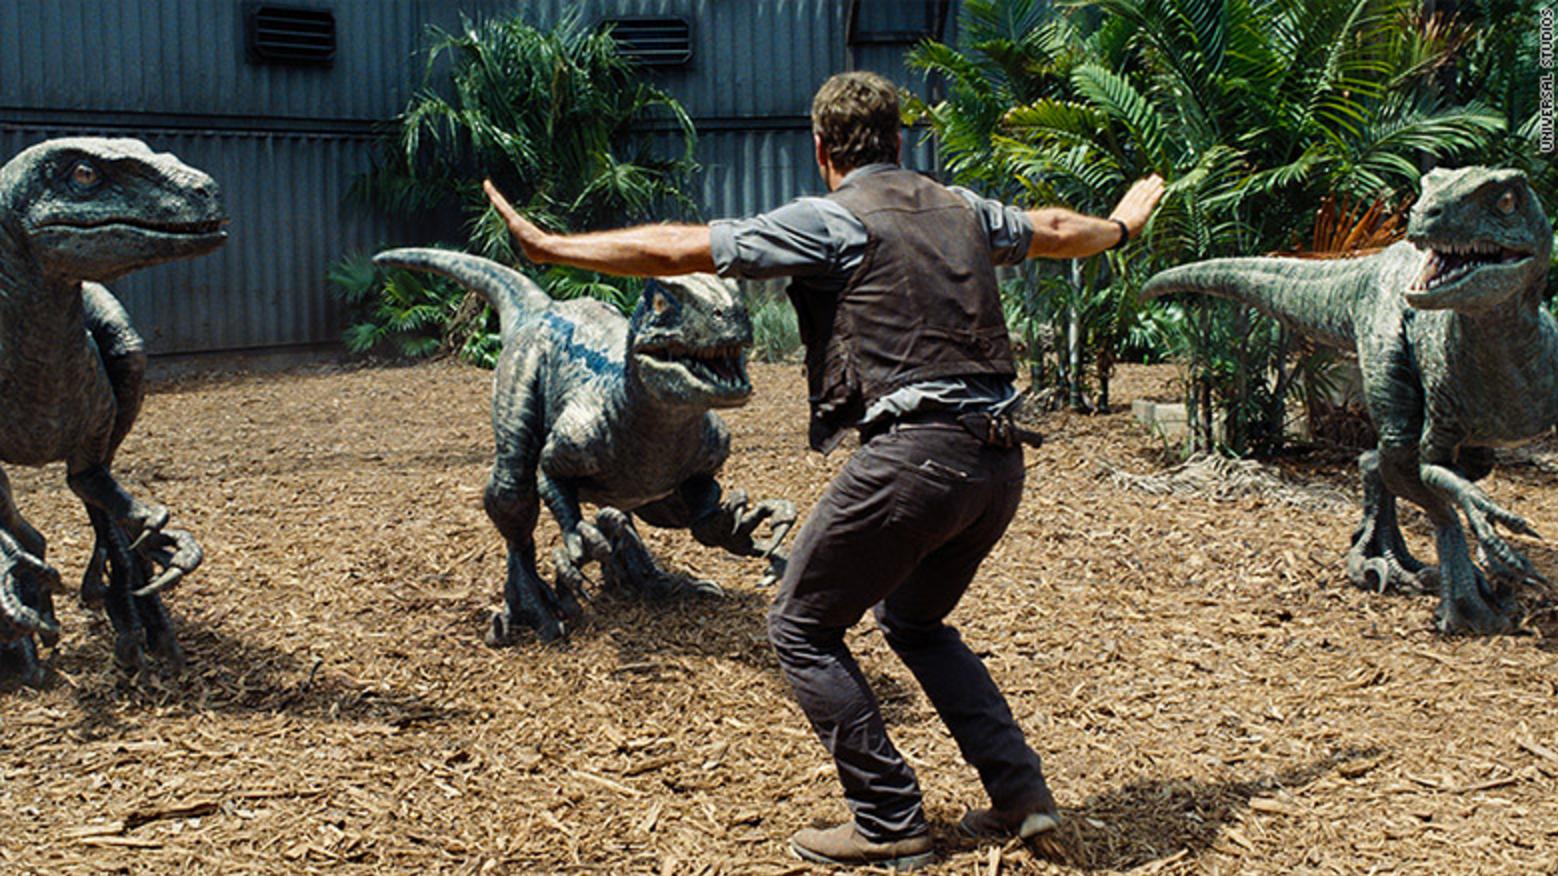 Doggies! I mean, Velociraptors!